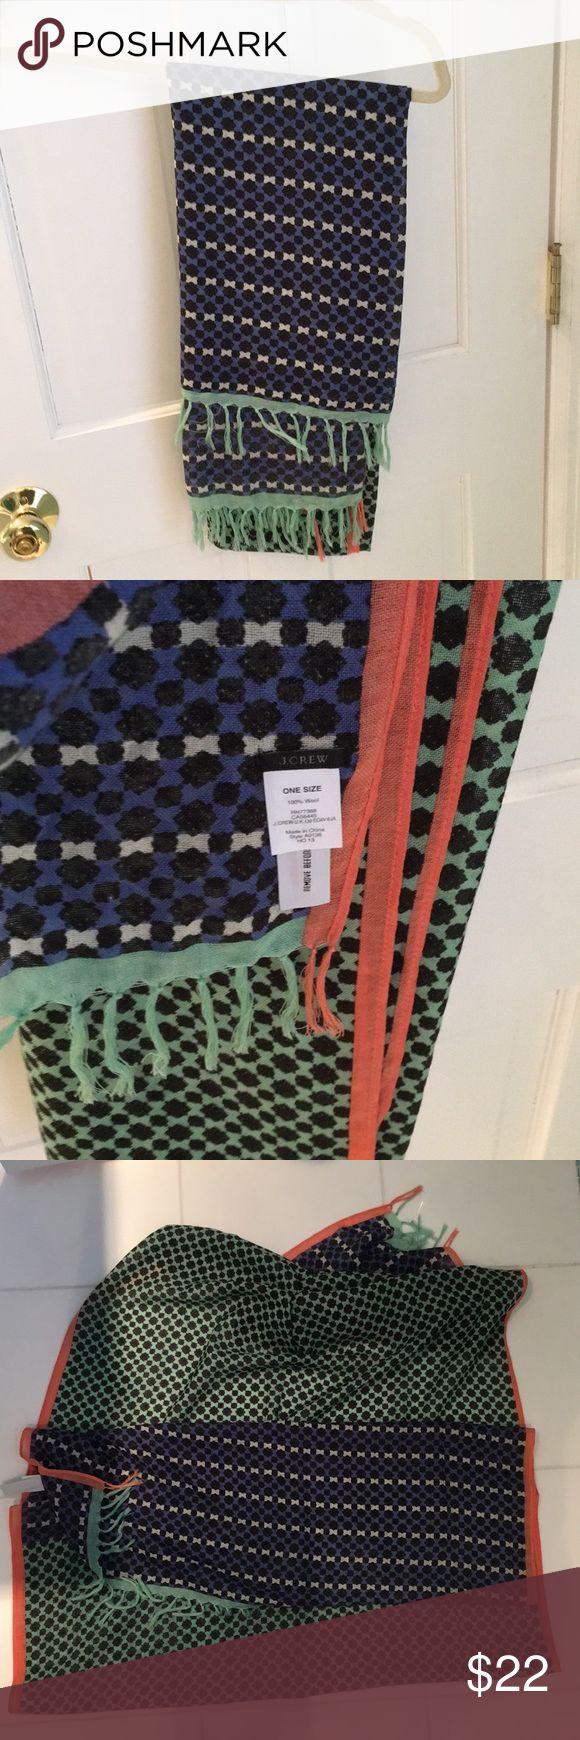 Jcrew multi color scarf/wrap Never worn J. Crew Accessories Scarves & Wraps